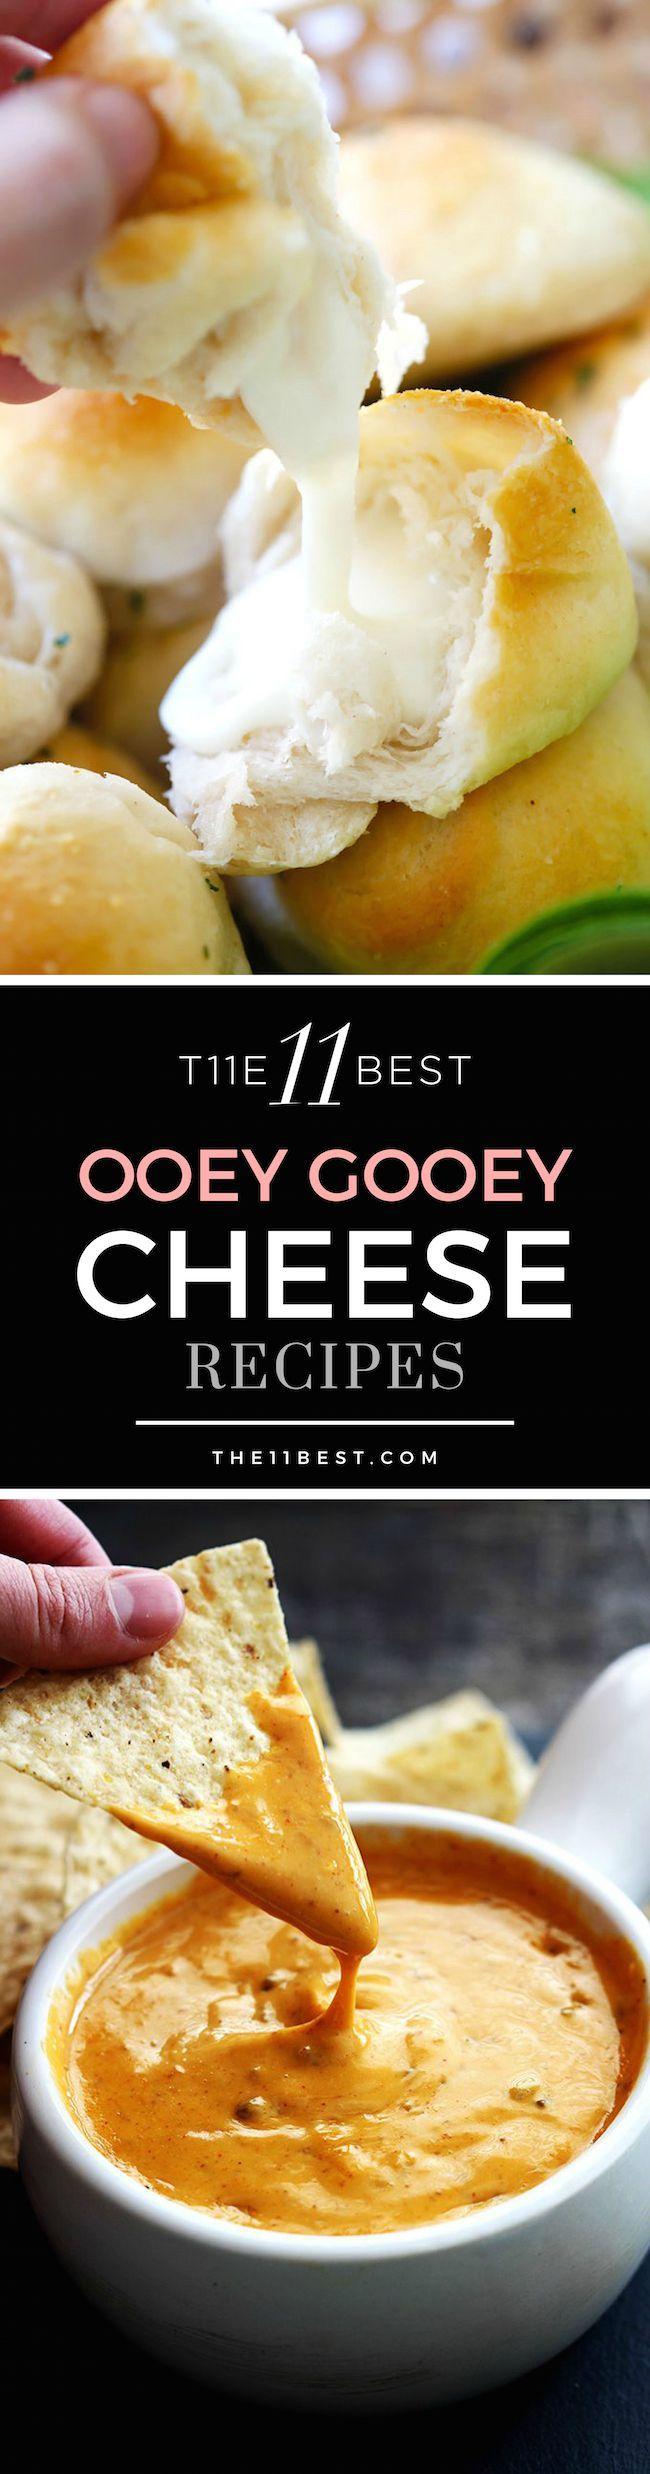 The 11 Best Ooey Gooey Cheese Recipes